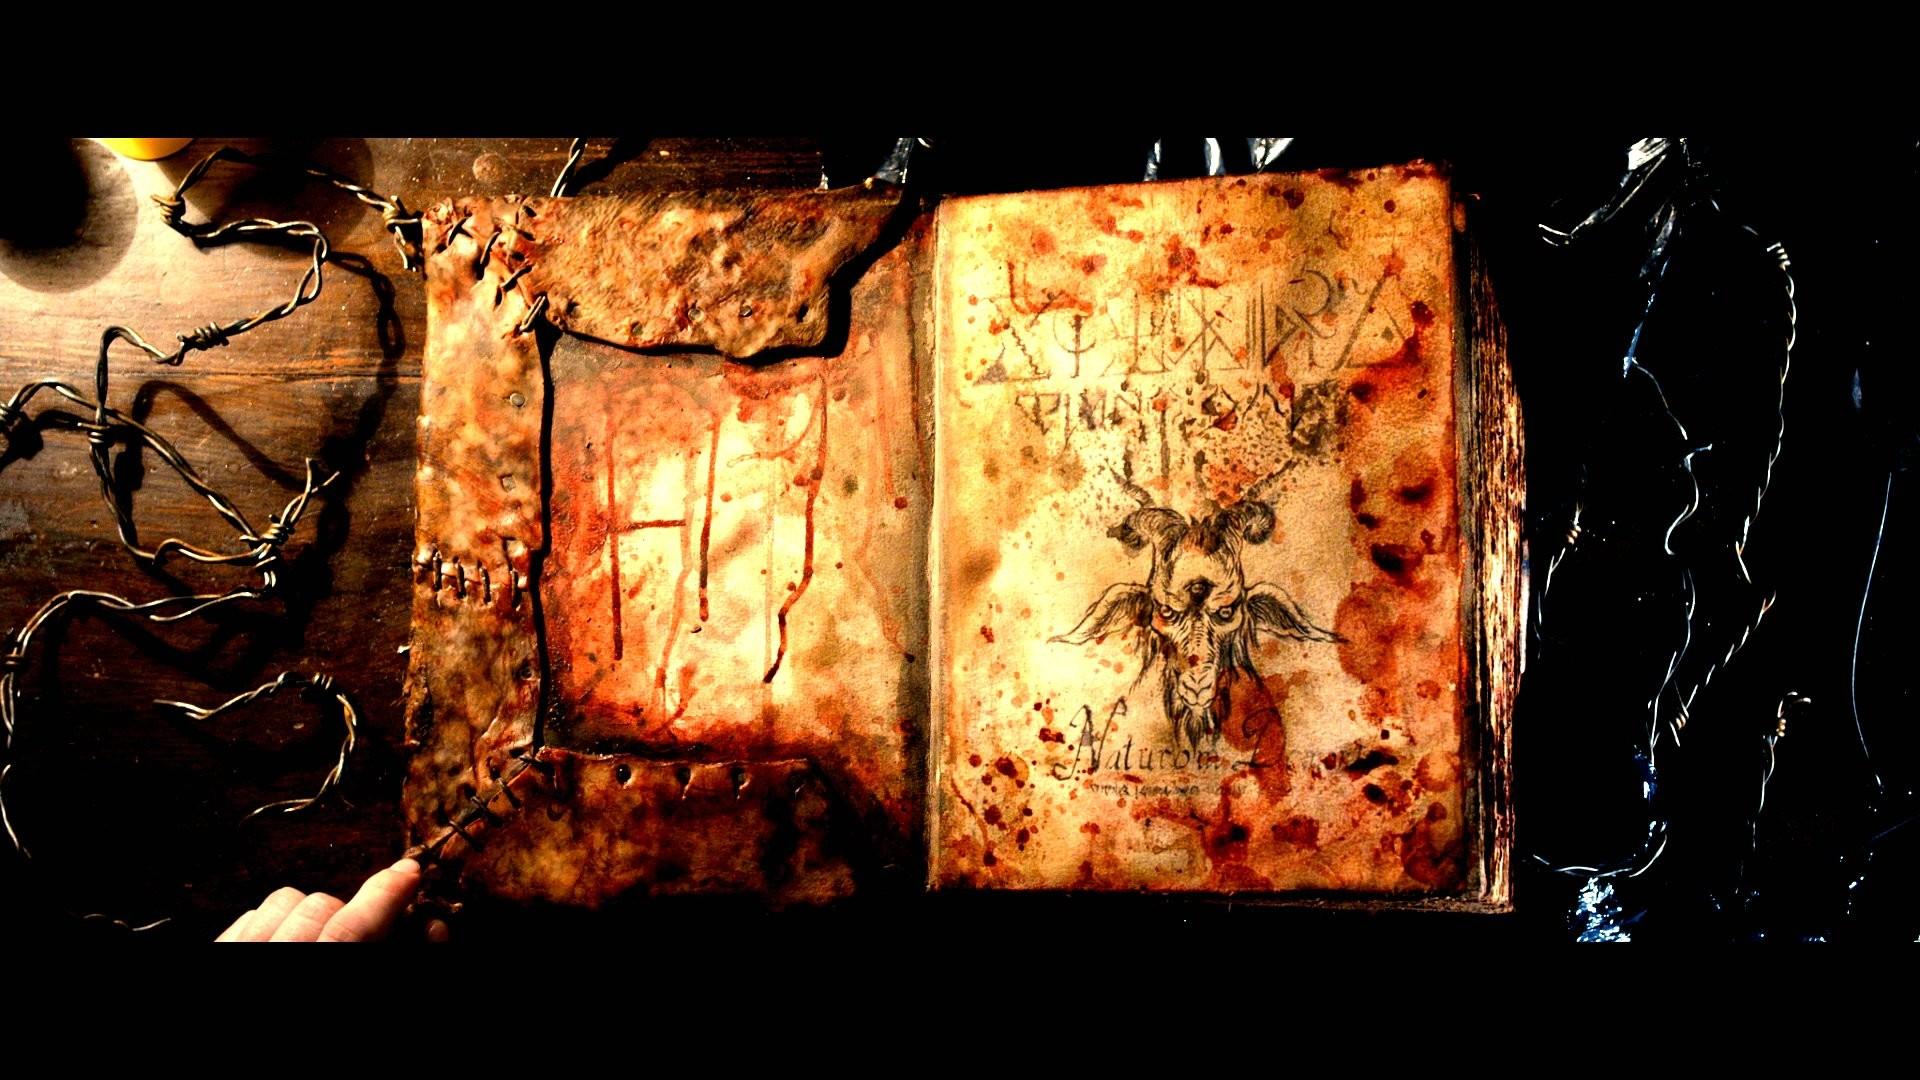 satanic demon satan d wallpaper     236068   WallpaperUP .